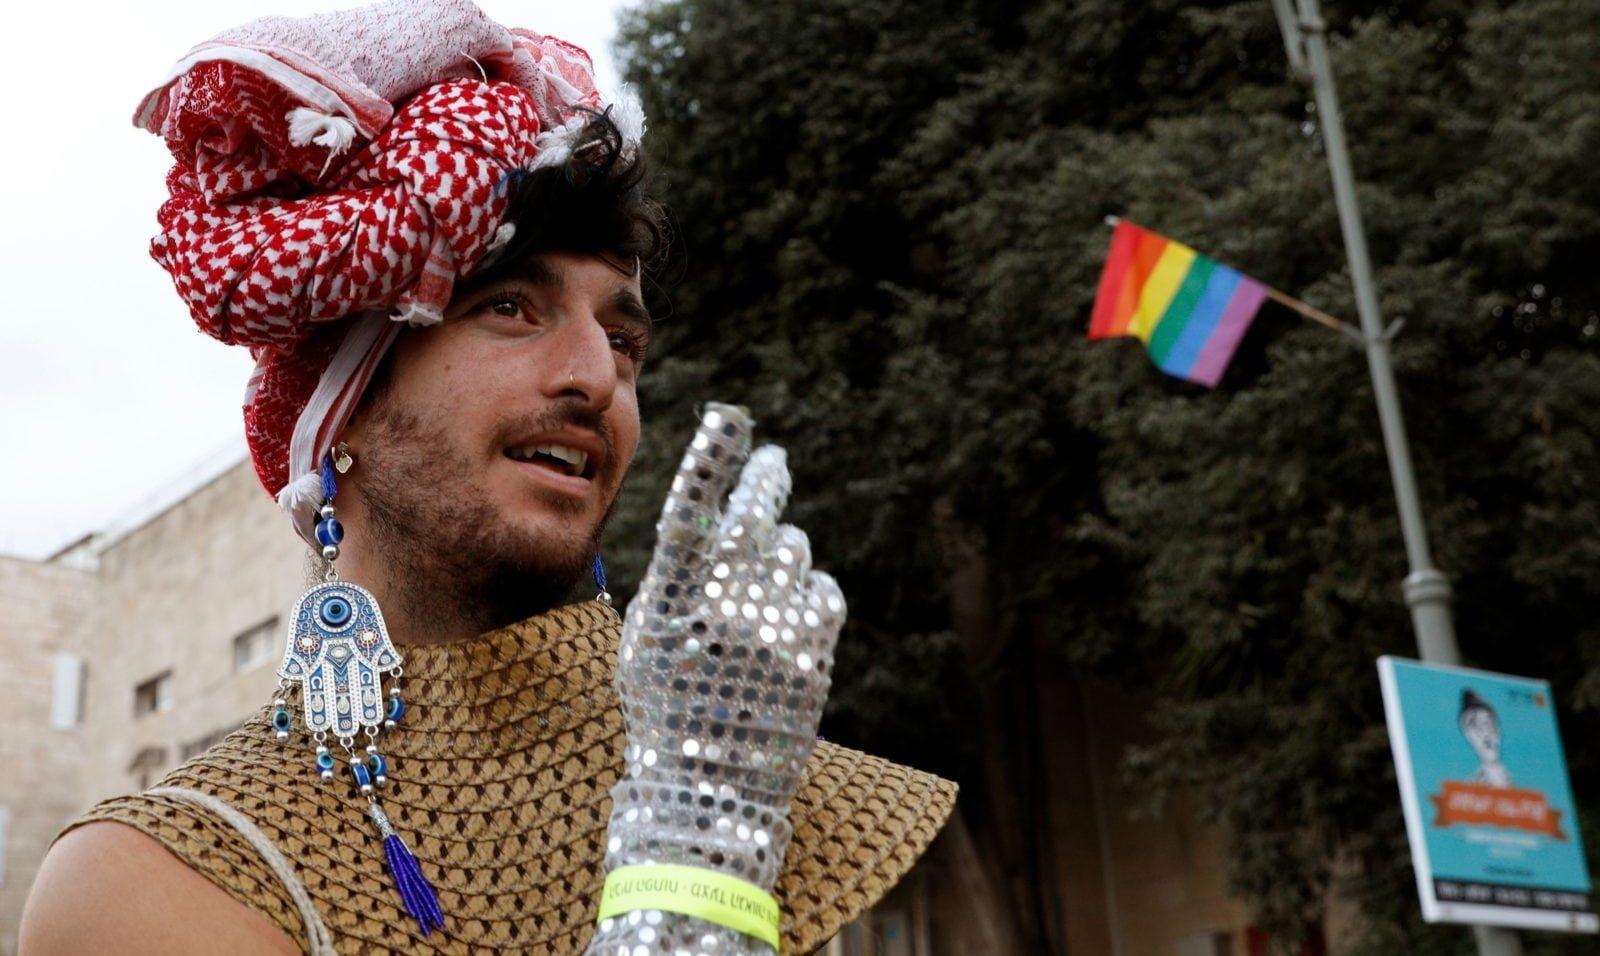 İsrail LGBT, Kudüs Onur Yürüyüşü ile 'Buradayız' Dedi